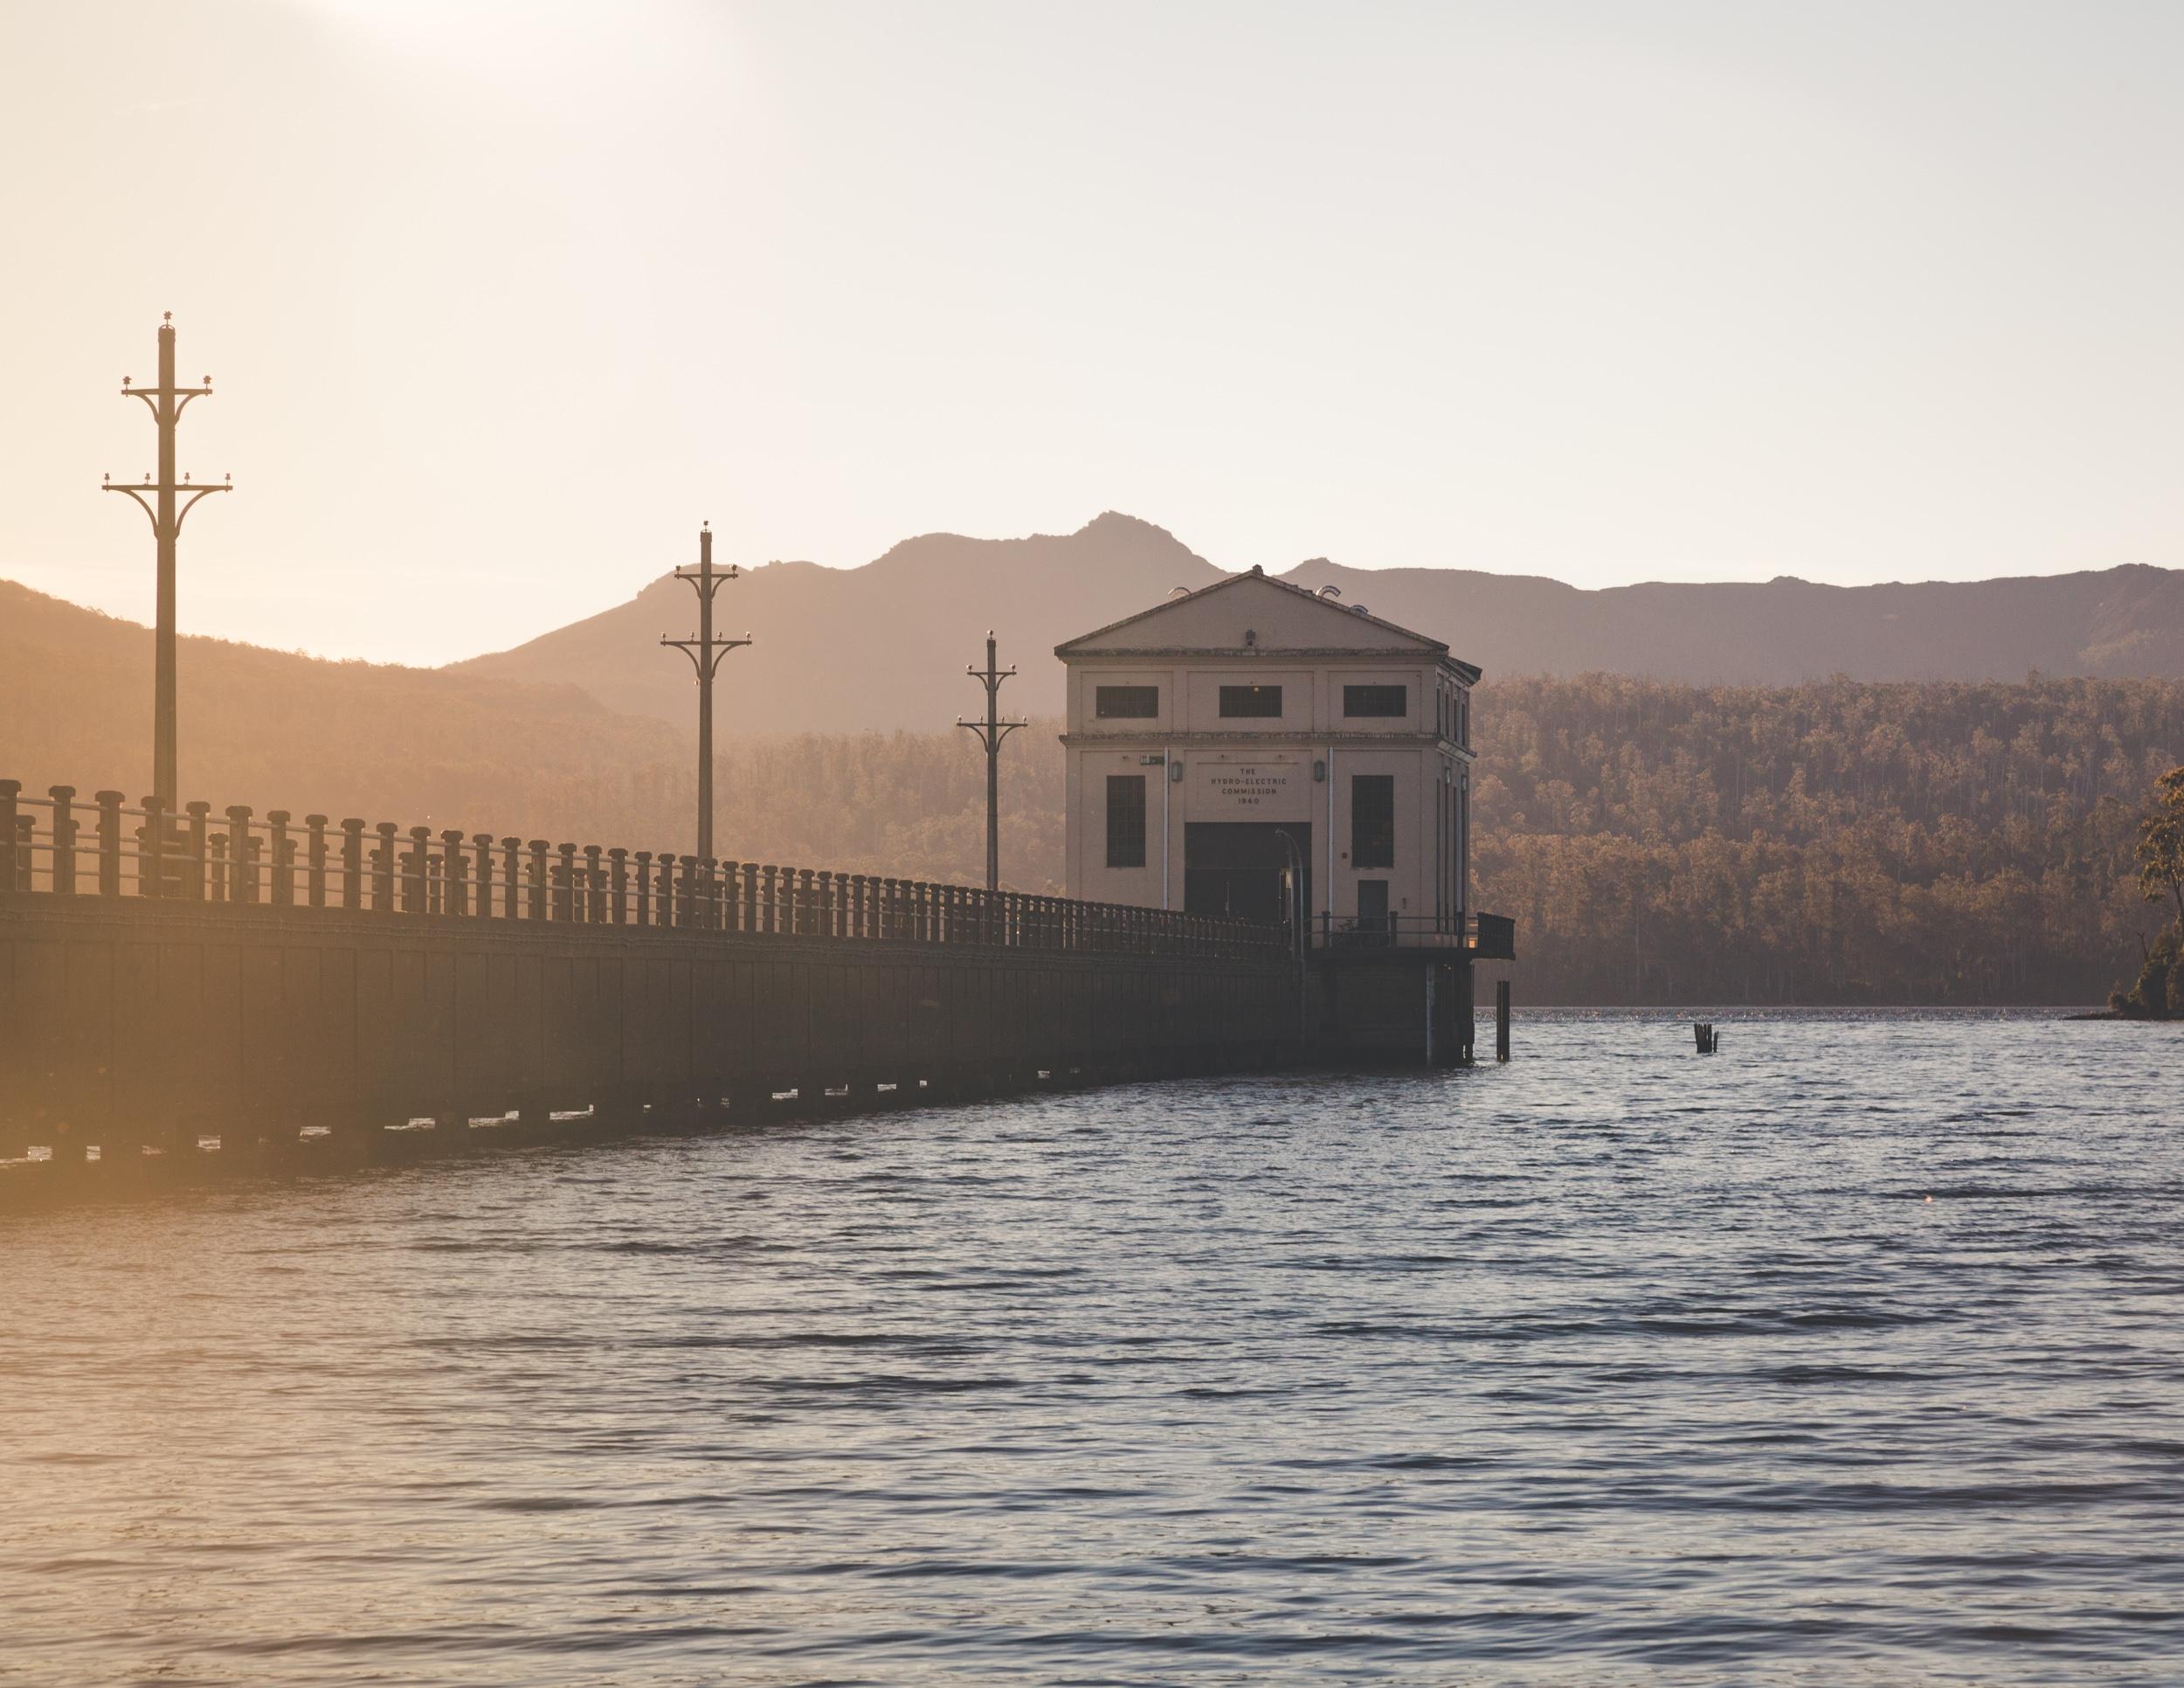 The Pumphouse at Lake St Clair